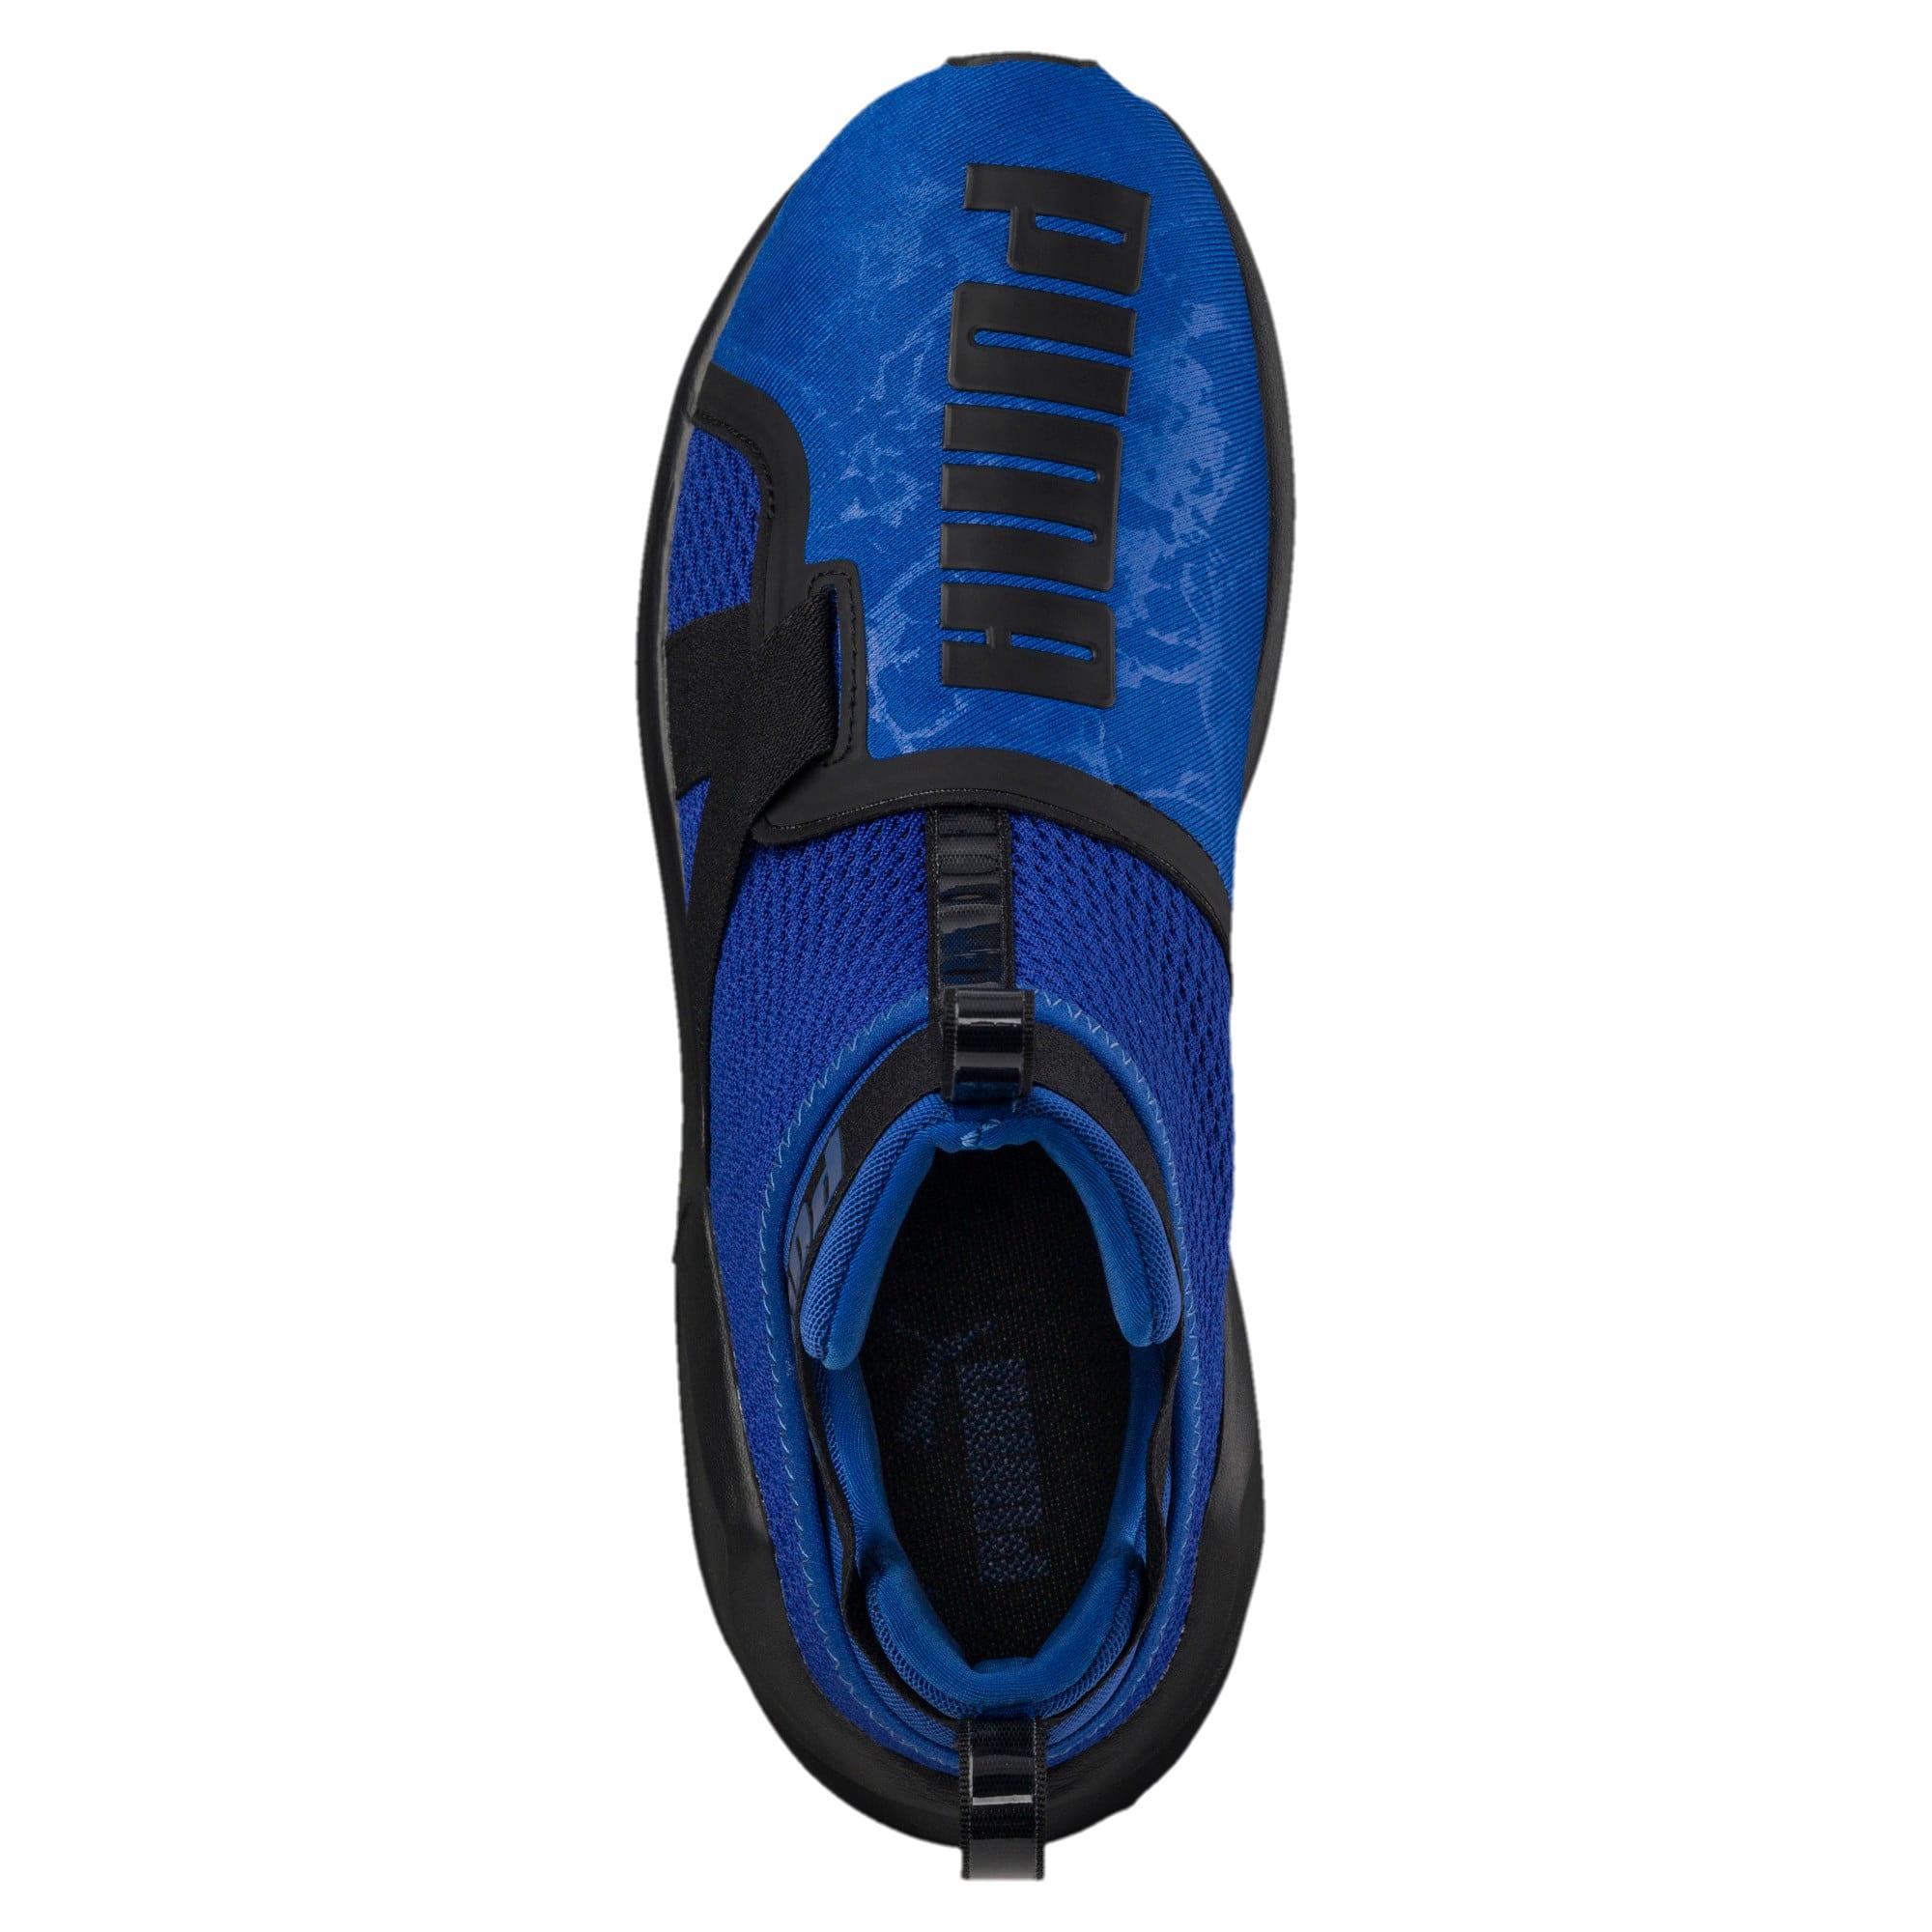 Thumbnail 5 of PUMA Fierce Strap Training Shoes, TRUE BLUE-Puma Black, medium-IND